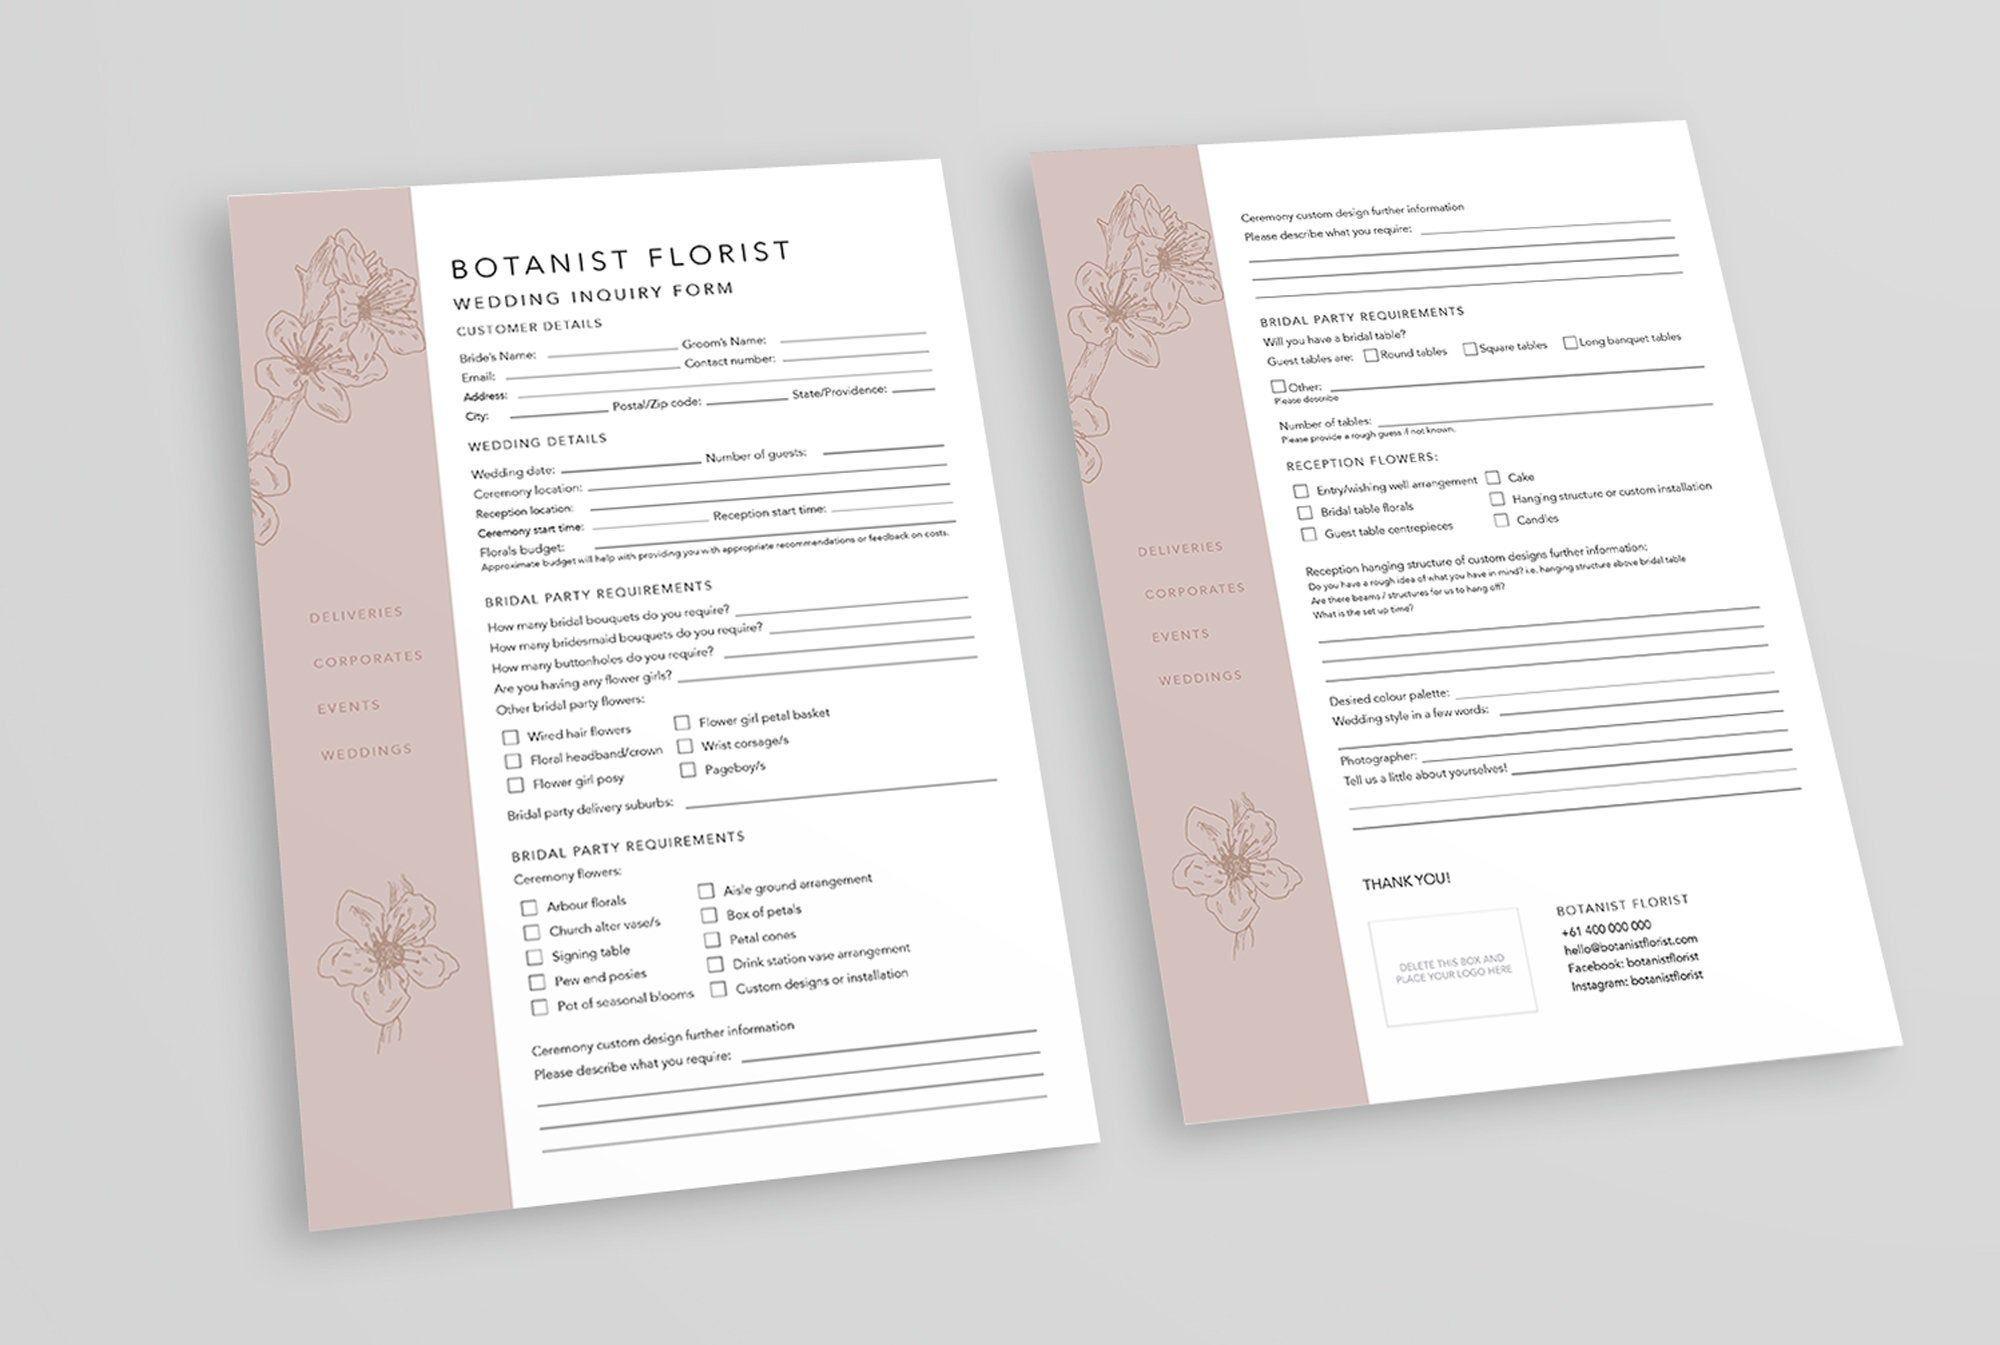 Florist Wedding Booking Form Florist Order Forms Wedding Order Forms Florist Templates Inquiry Form Wedding Order Wedding Book Florist Wedding flowers order form template